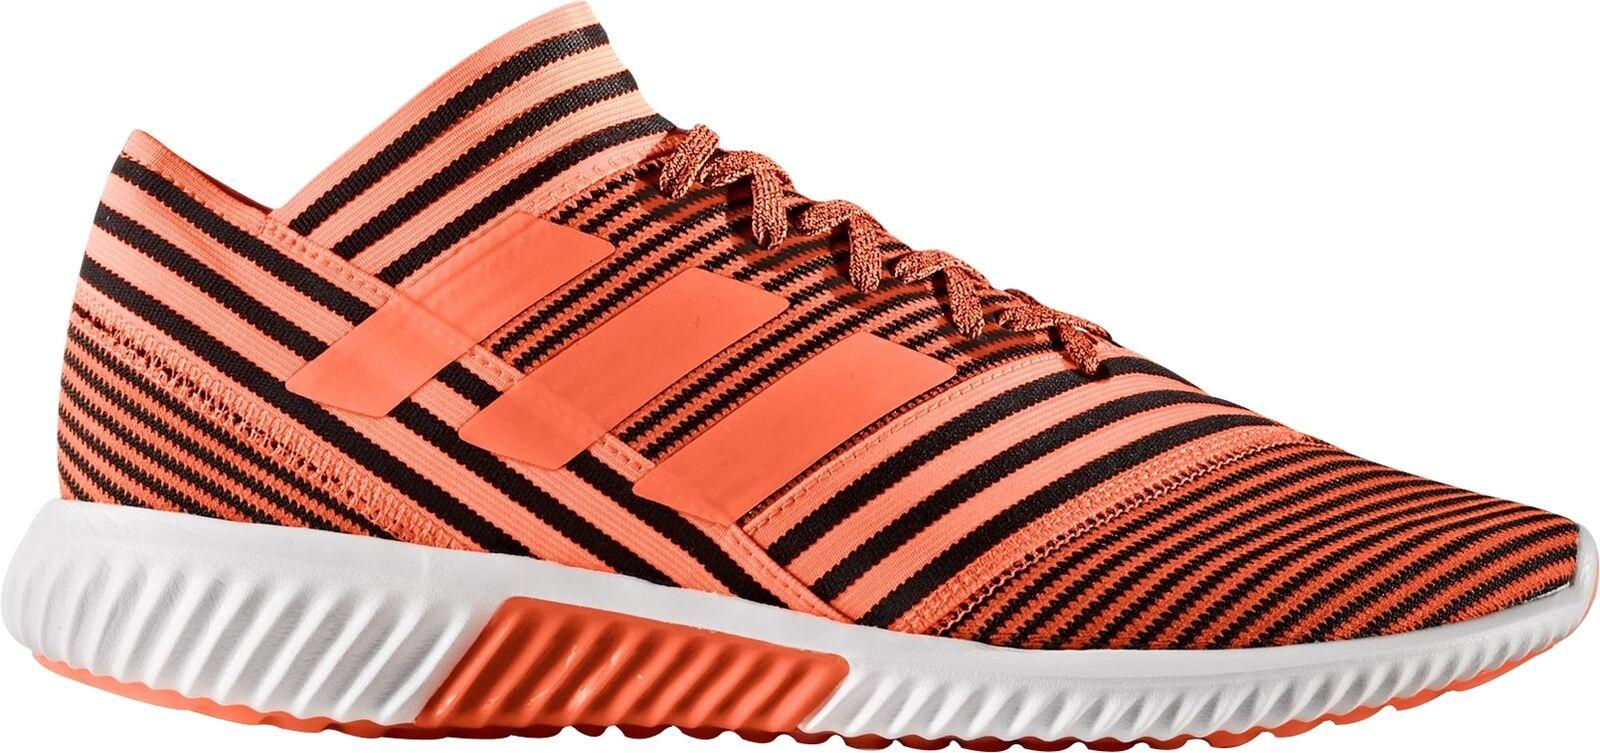 Adidas Nemeziz Tango 17.1 Mens Trainers - arancia